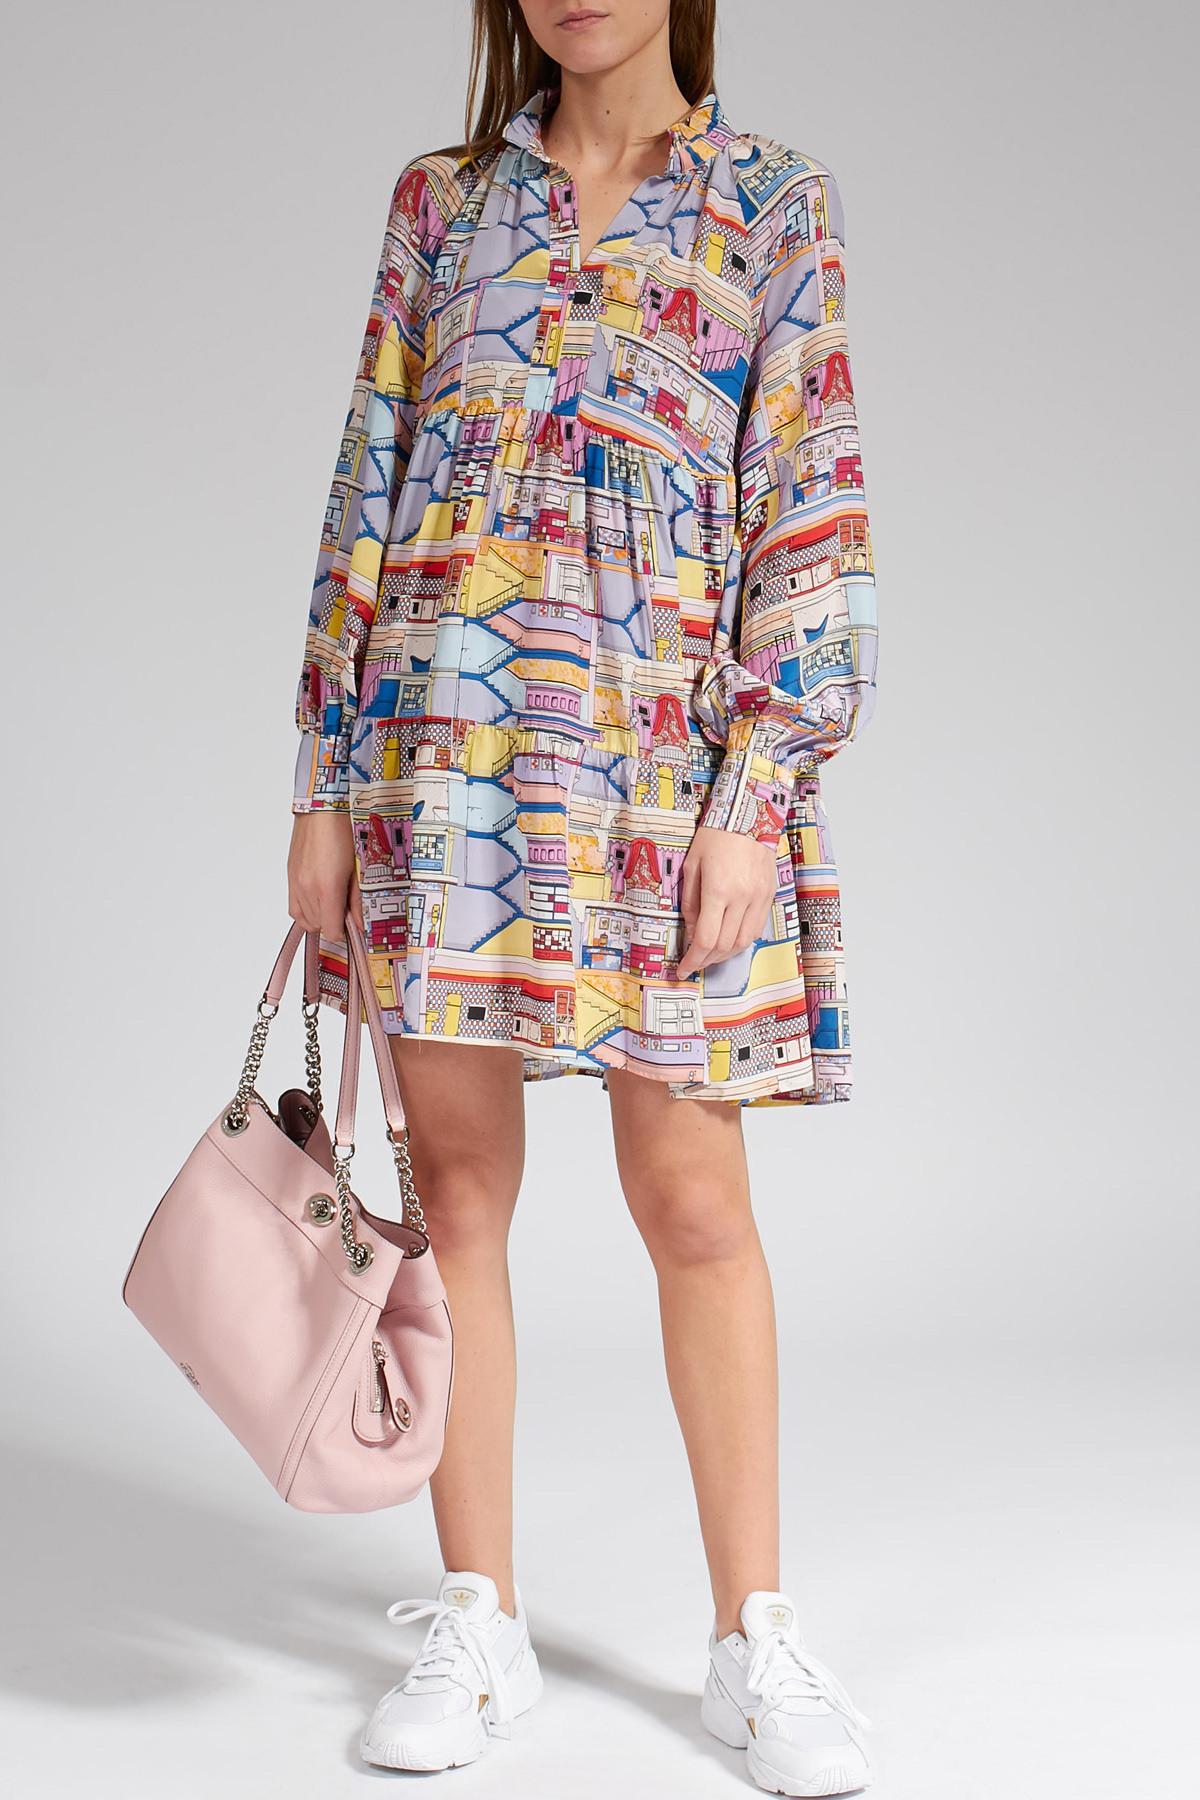 Gemustertes Kleid Aus Seide  Stine Goya  Myclassico